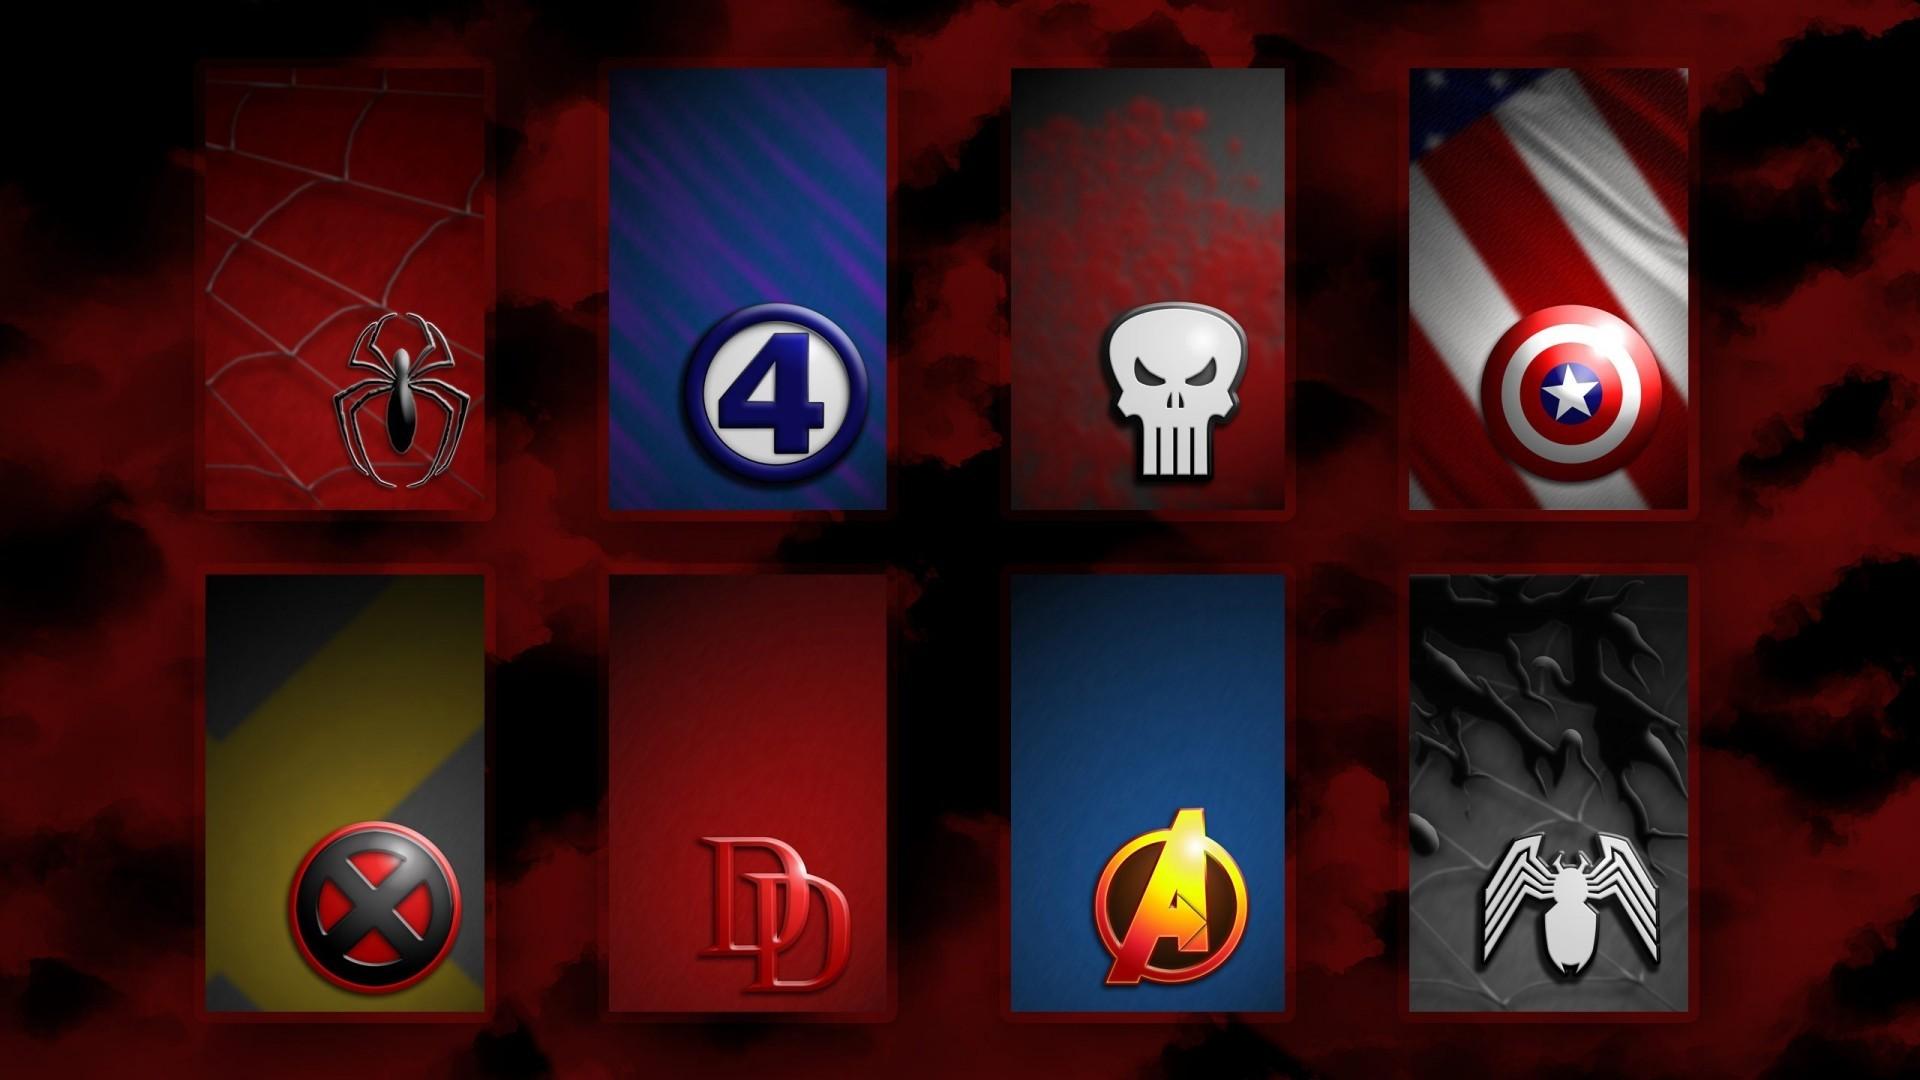 Daredevil wallpapers desktop